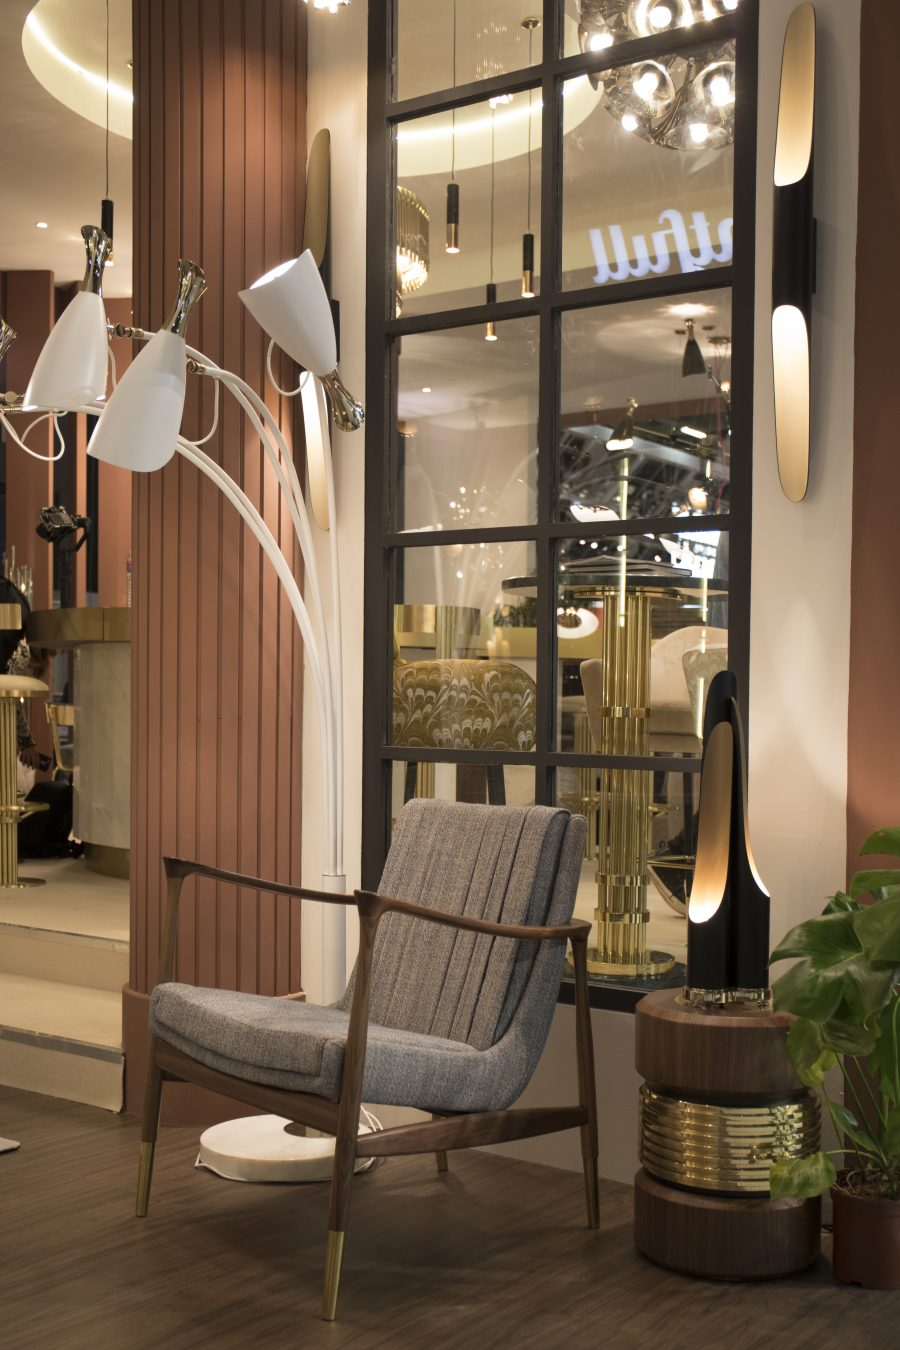 mid-century furniture Amazing Mid-Century Furniture At Maison Et Objet Mid Century Furniture At Maison Et Objet 2019 9